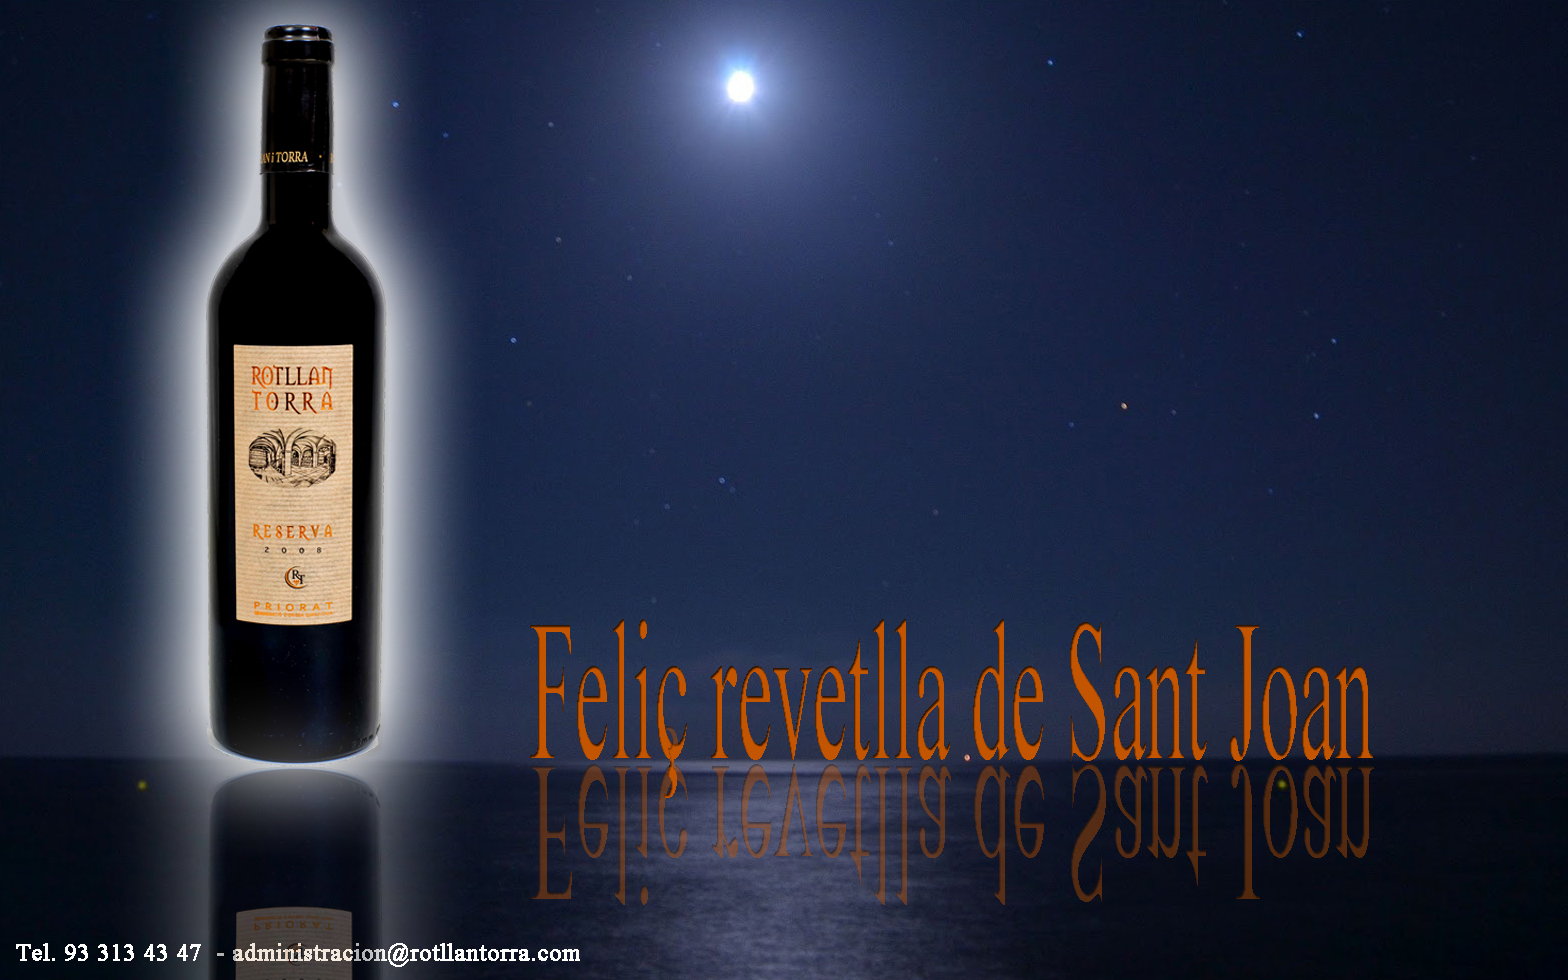 Feliç revetlla de Sant Joan